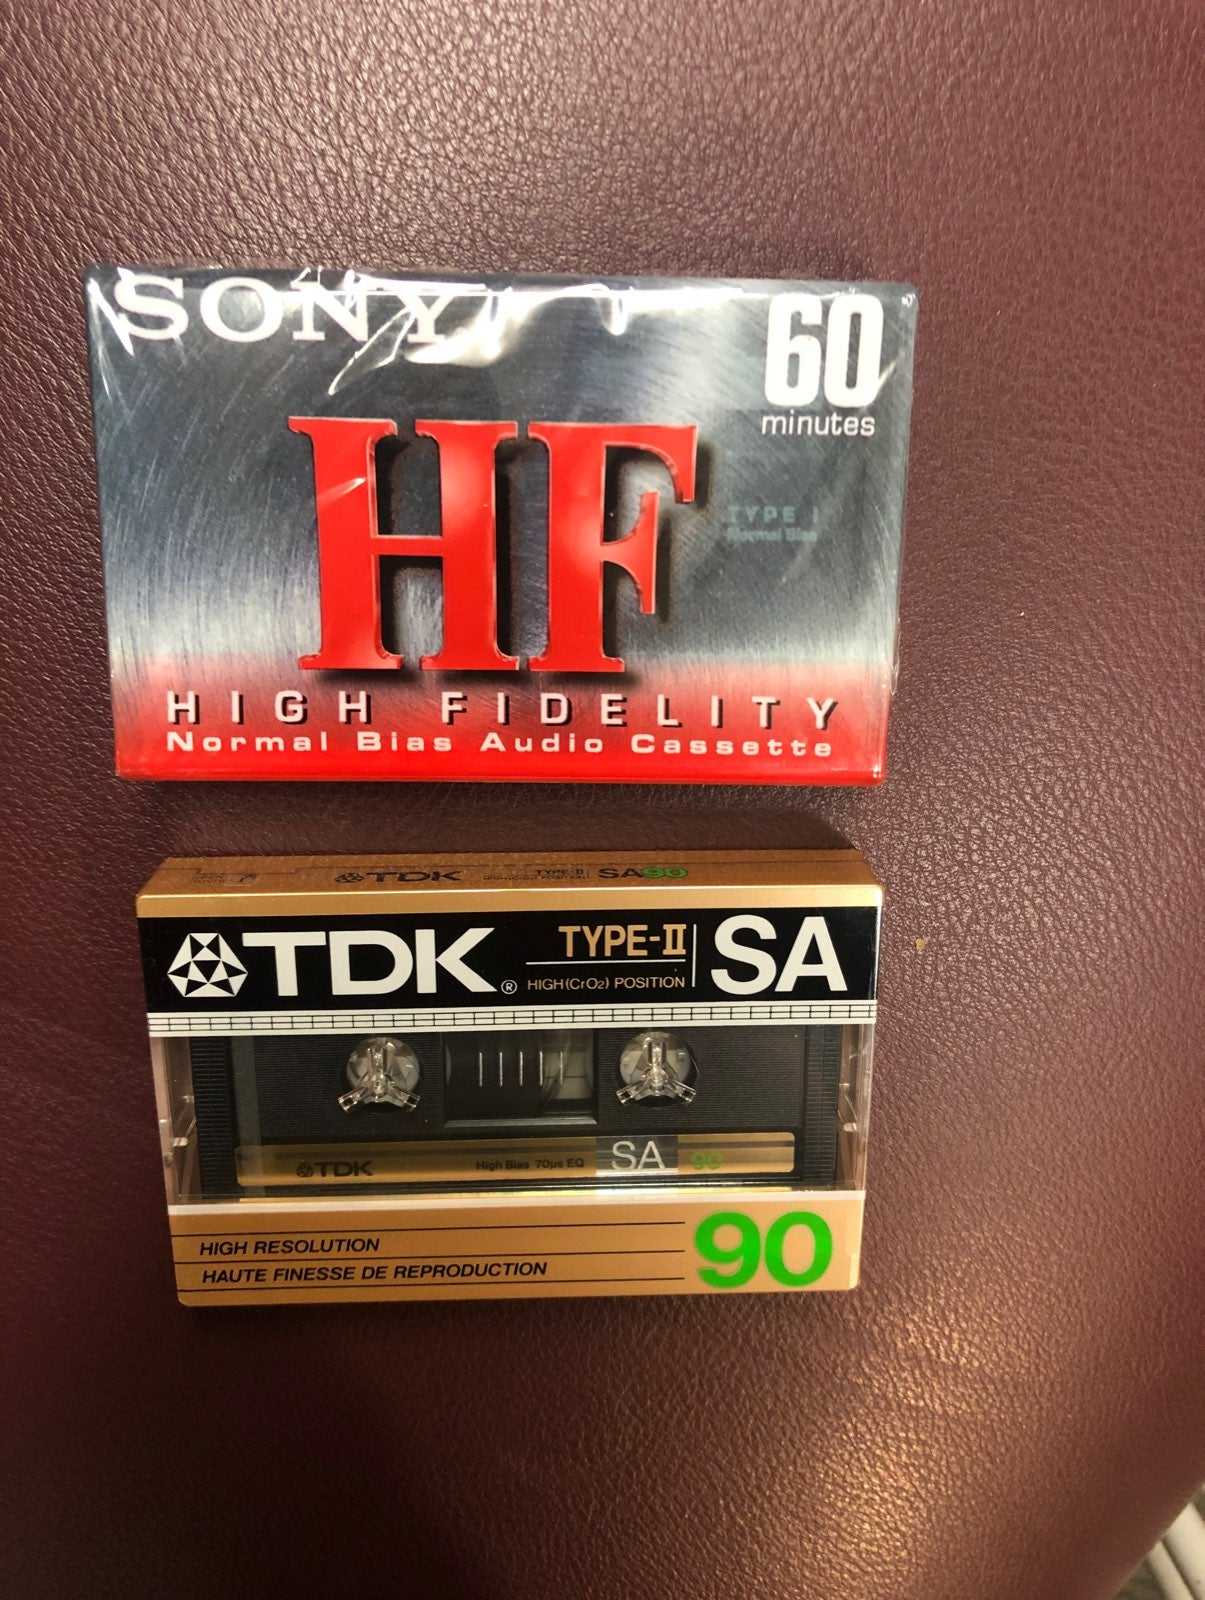 X2 hi-fi cassette tapes - blank sony